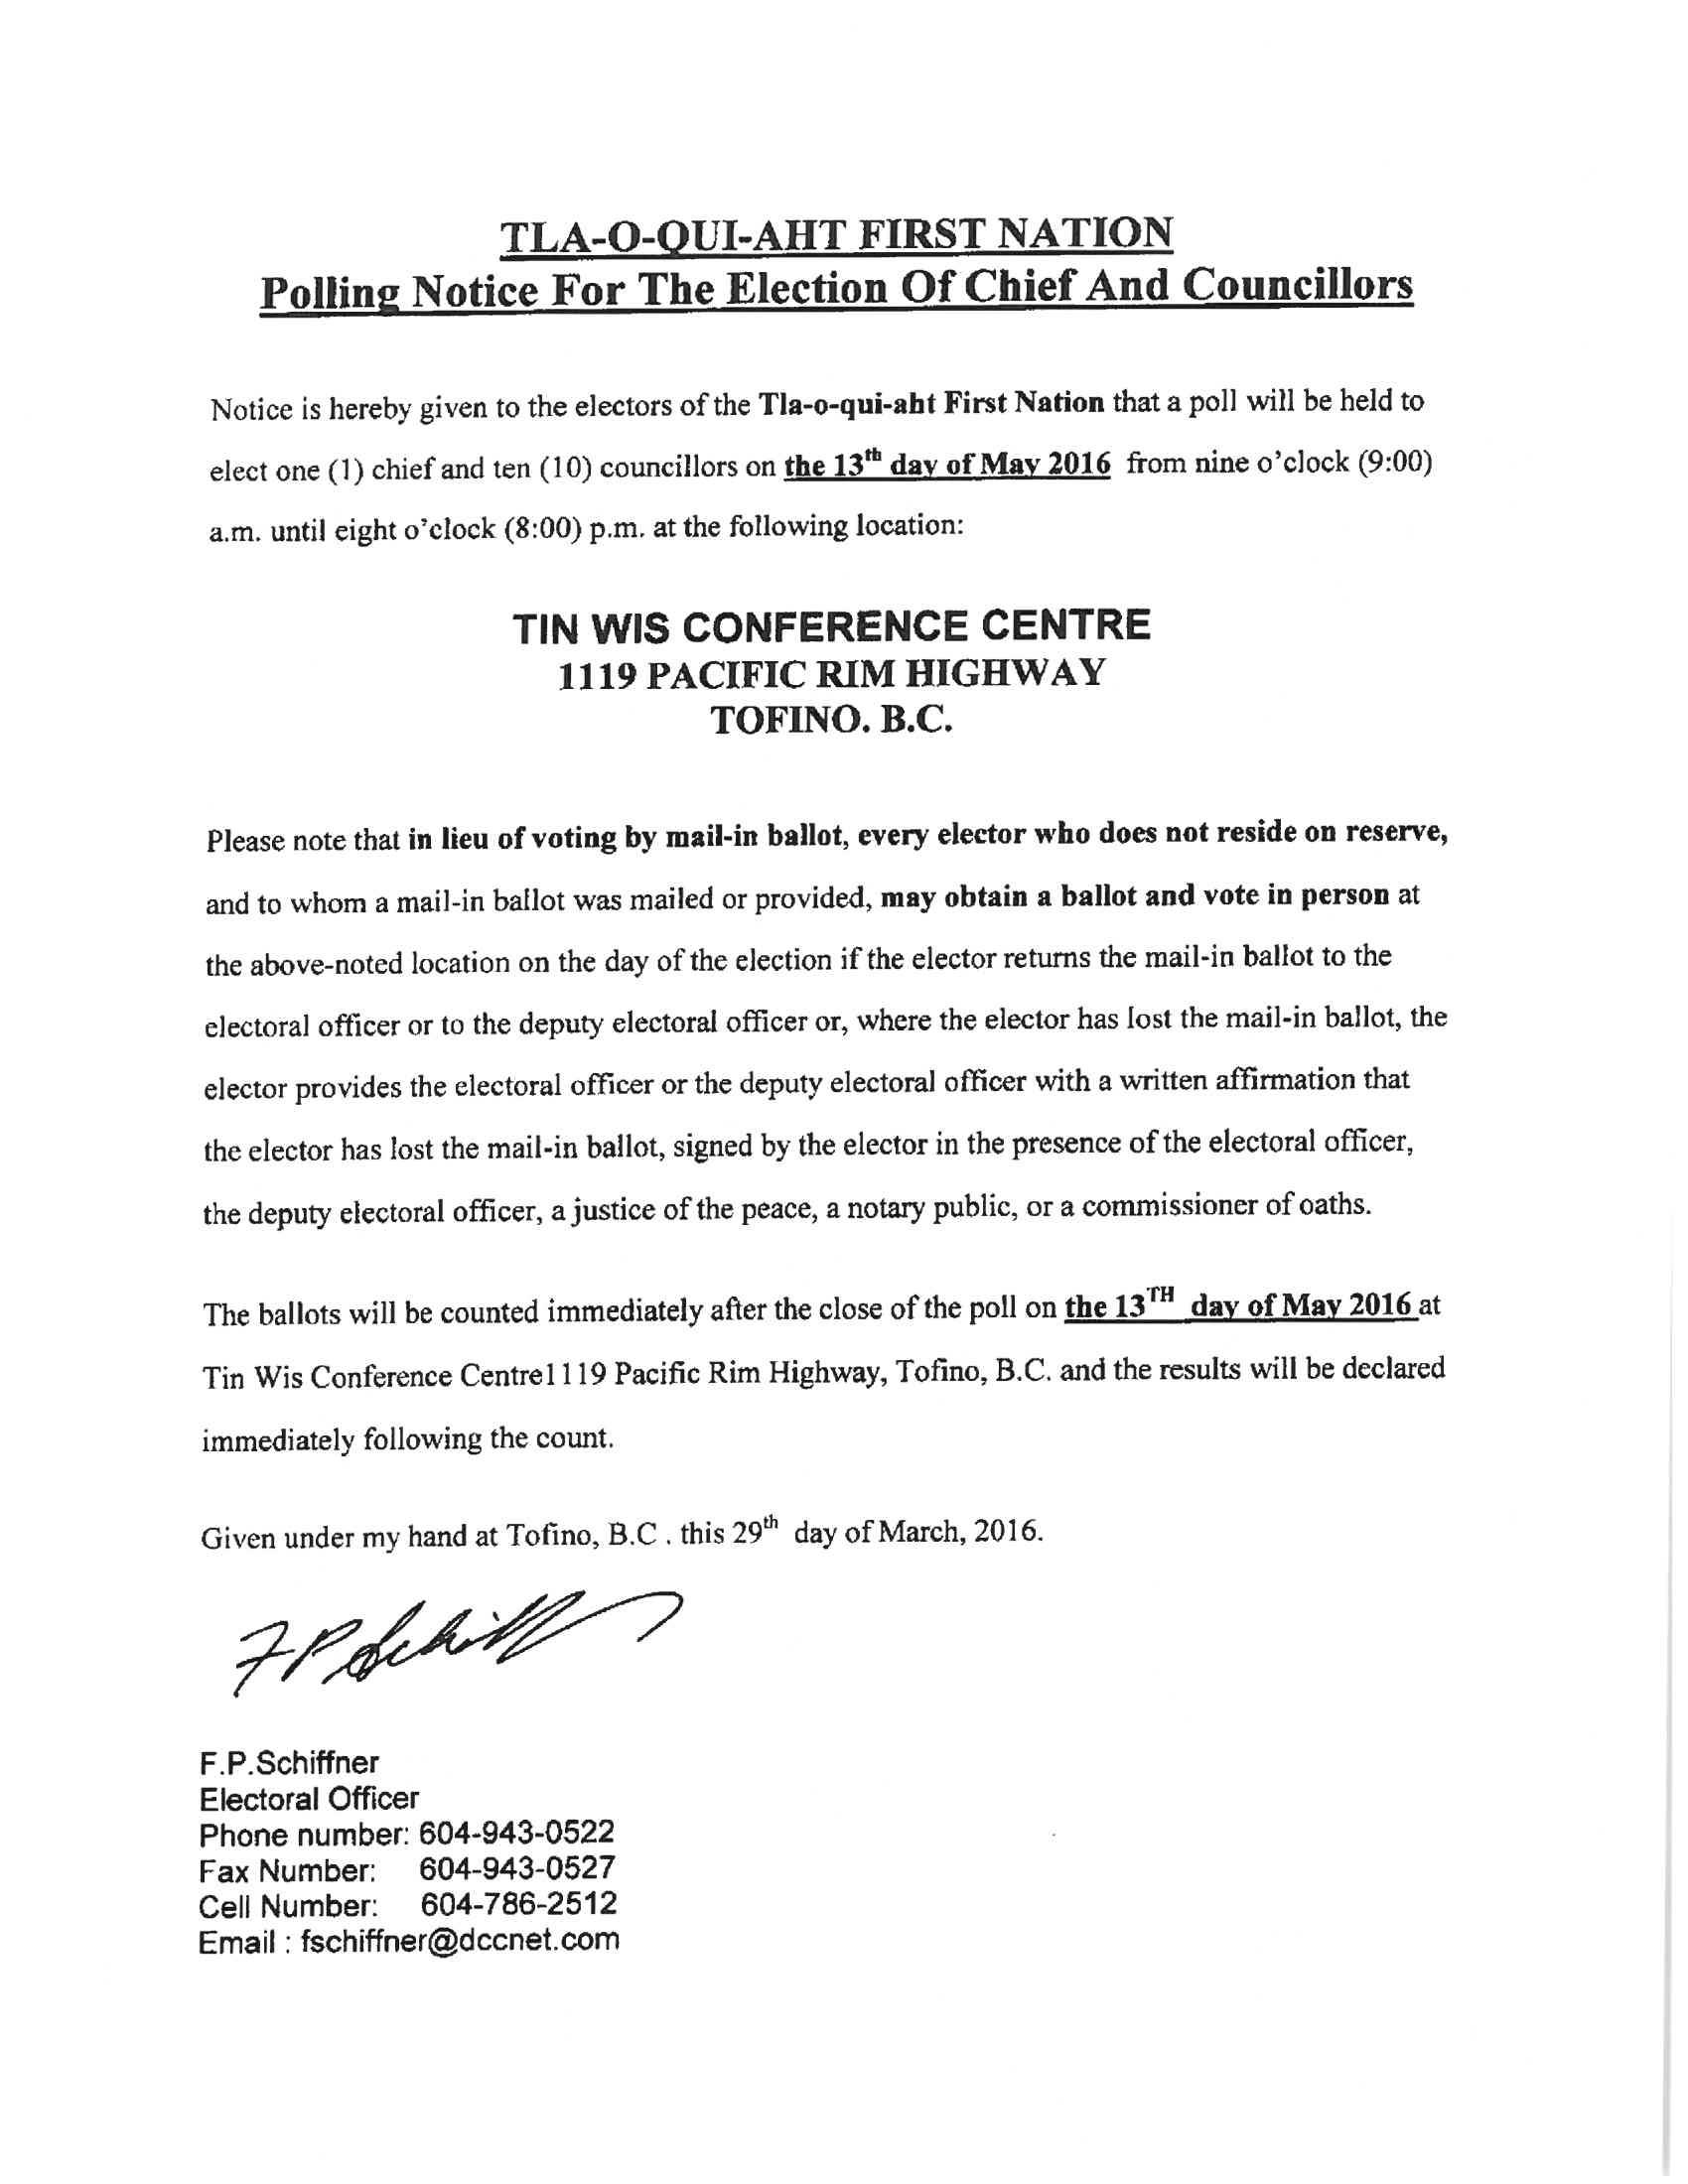 TFN Bulletin Apr 6-2016_Page_43.jpg